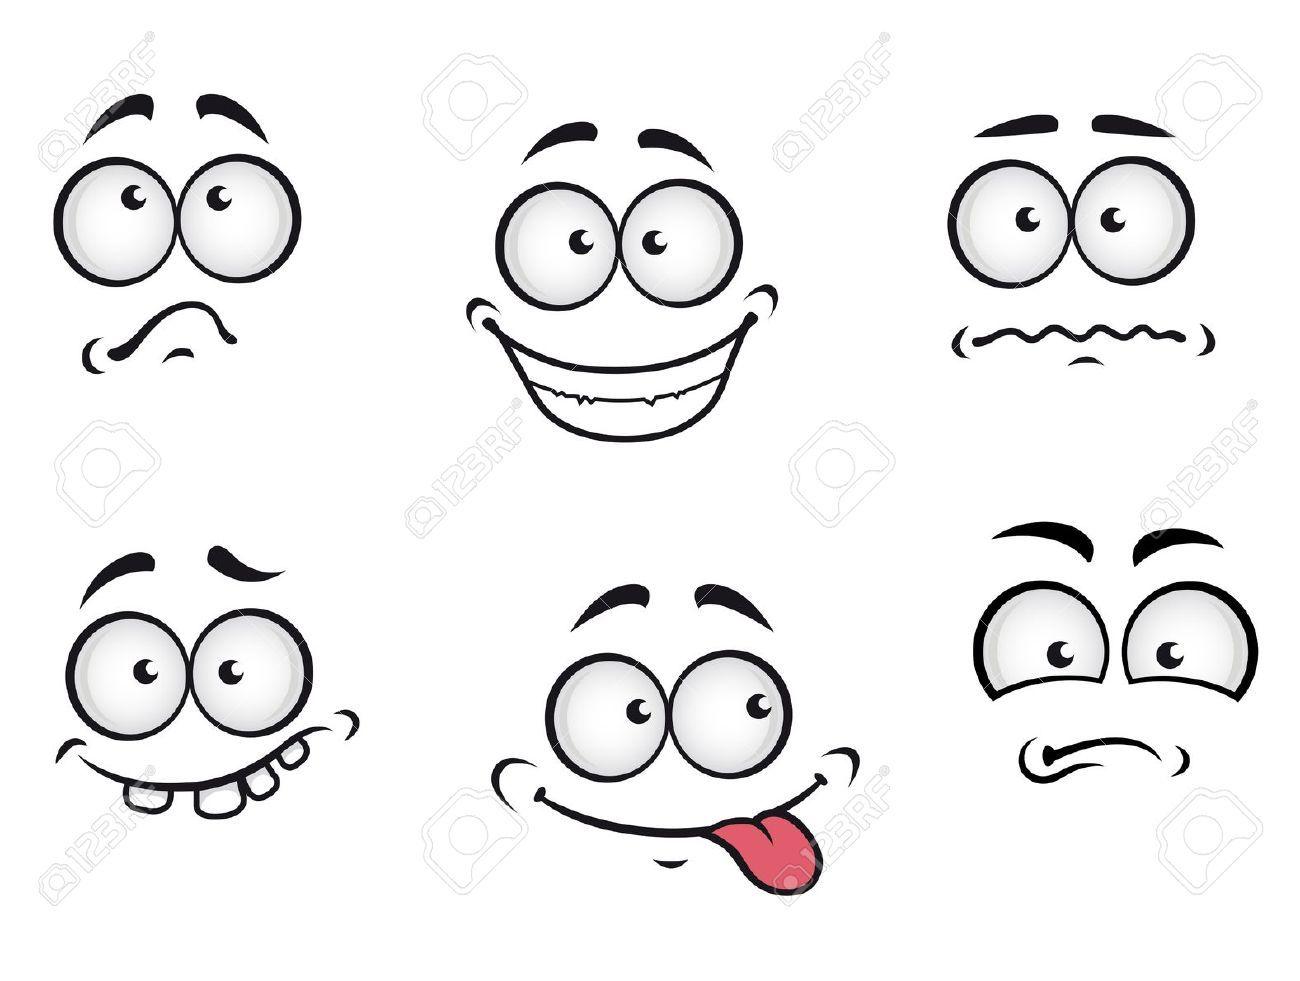 Emotions Sketch